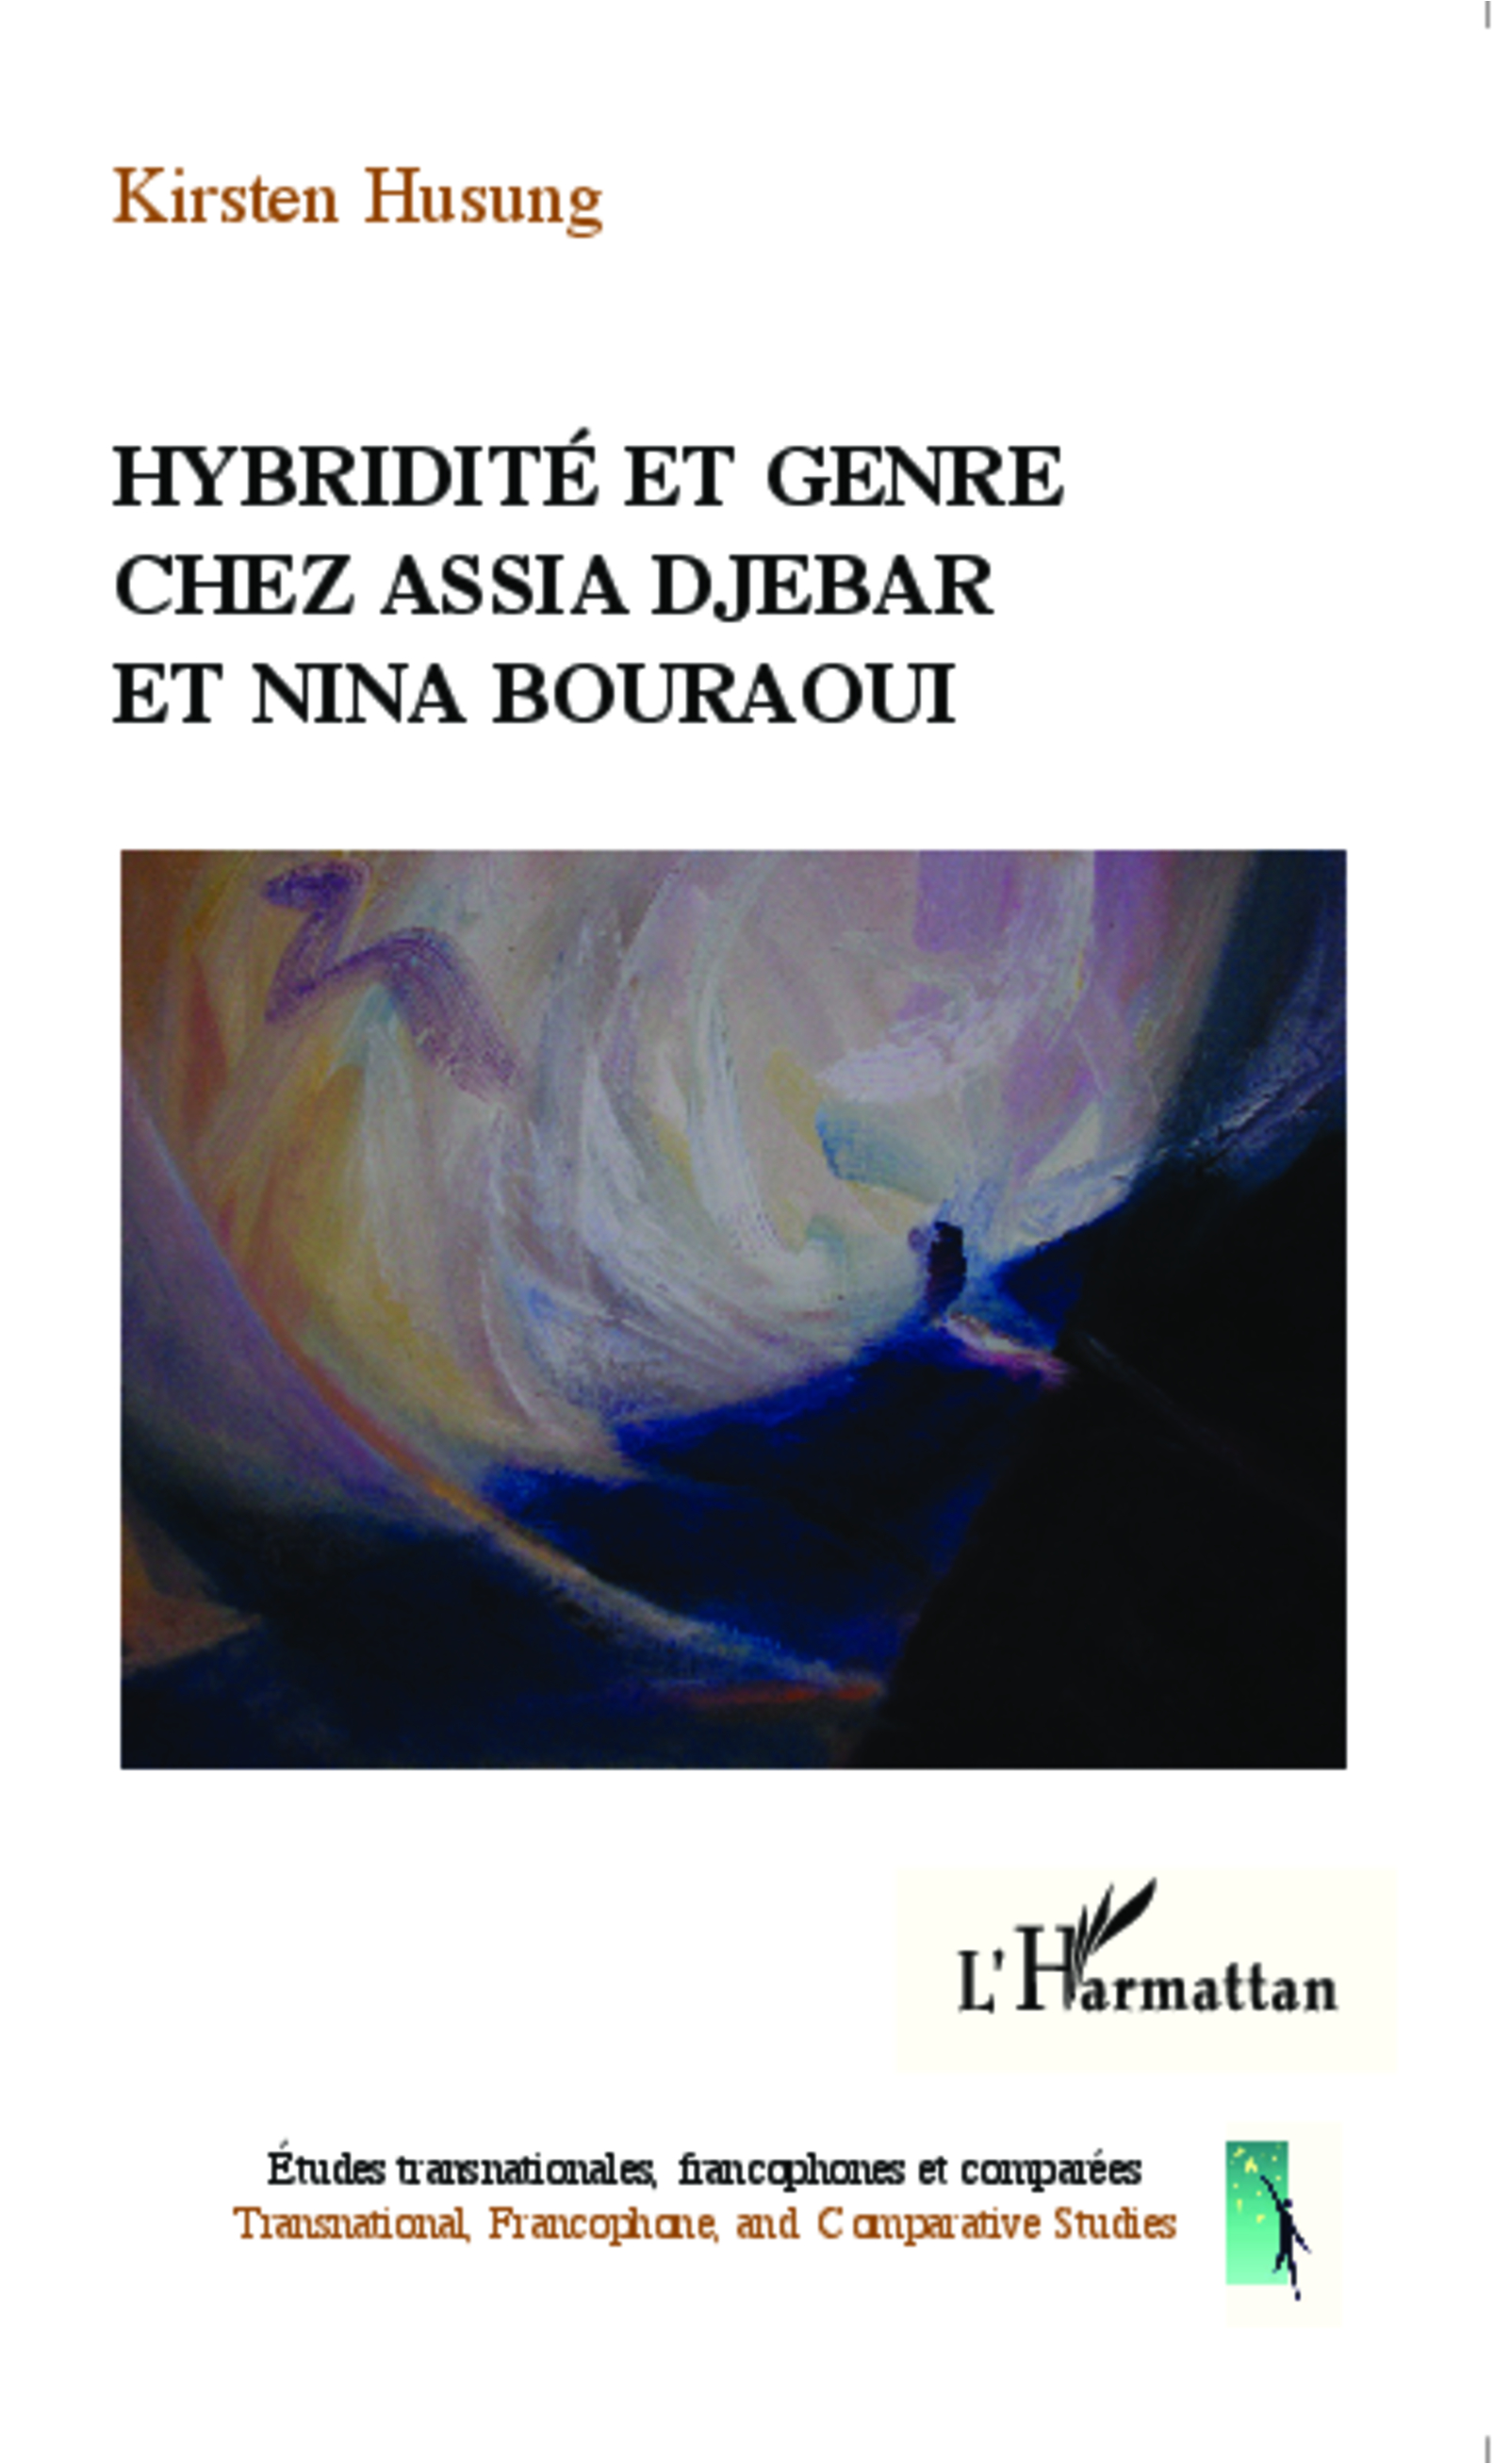 K. Husung, Hybridité et genre chez Assia Djebar et Nina Bouraoui